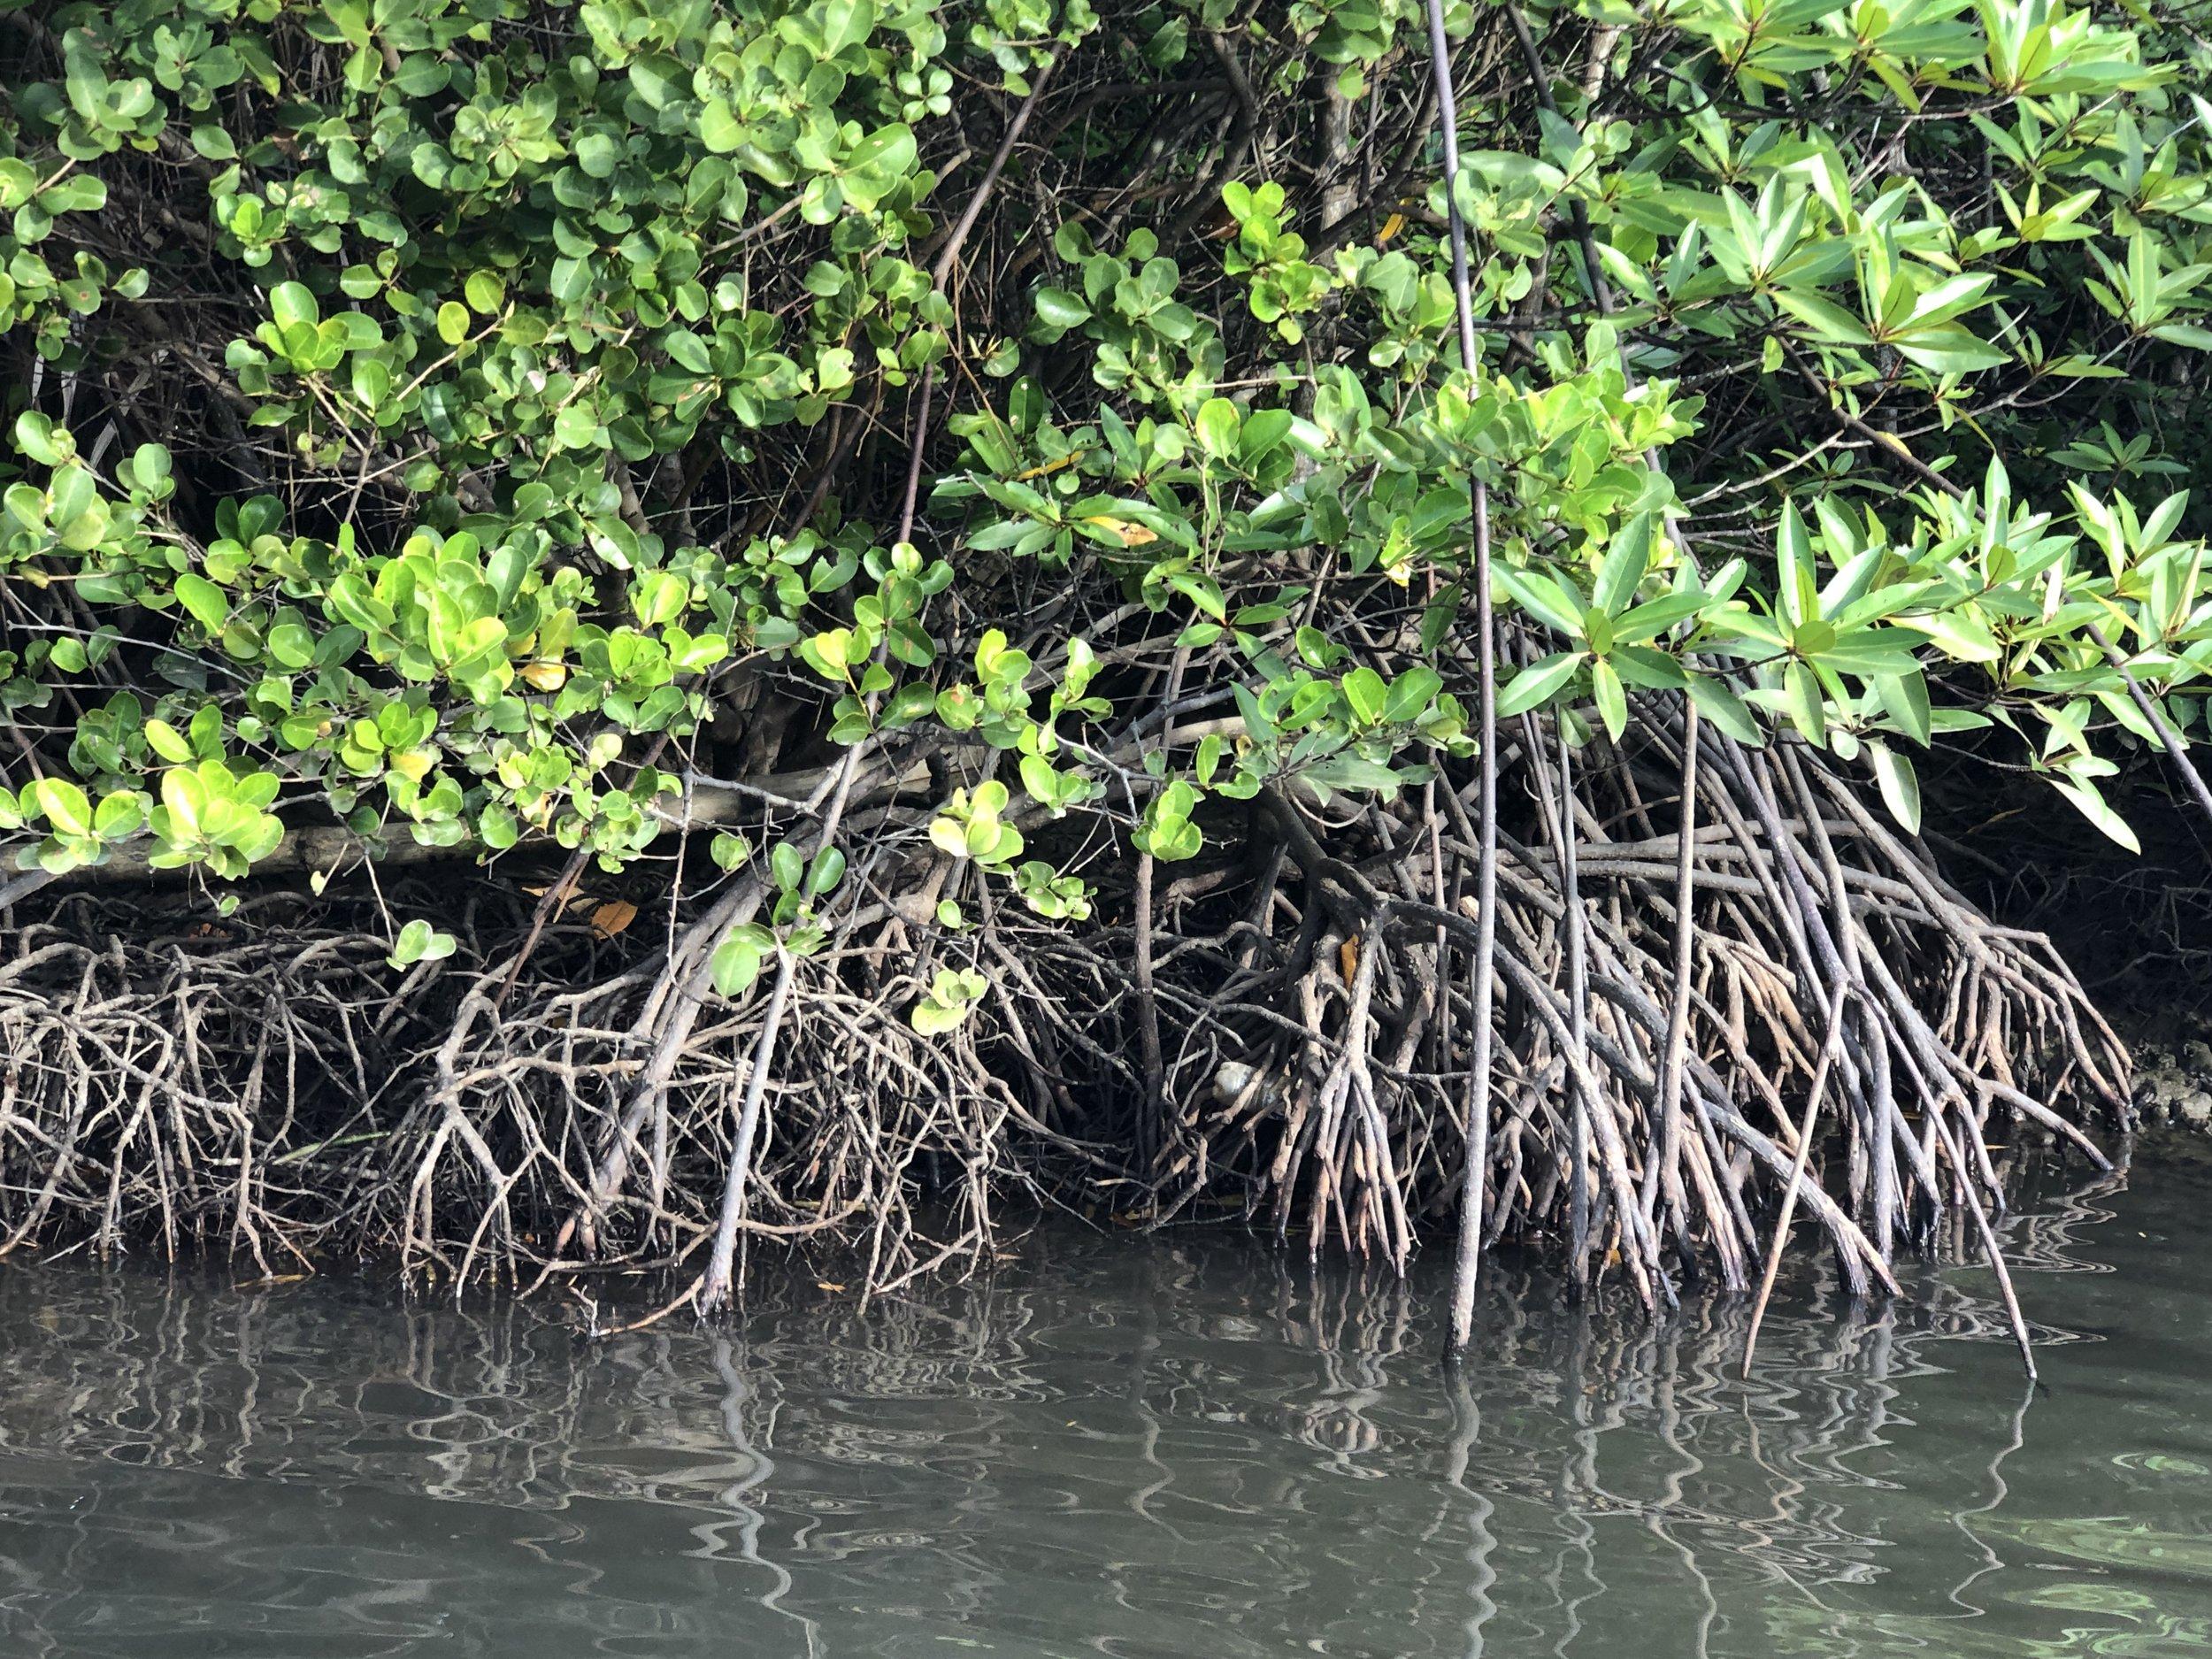 Mangrove by the side of River Nanamun